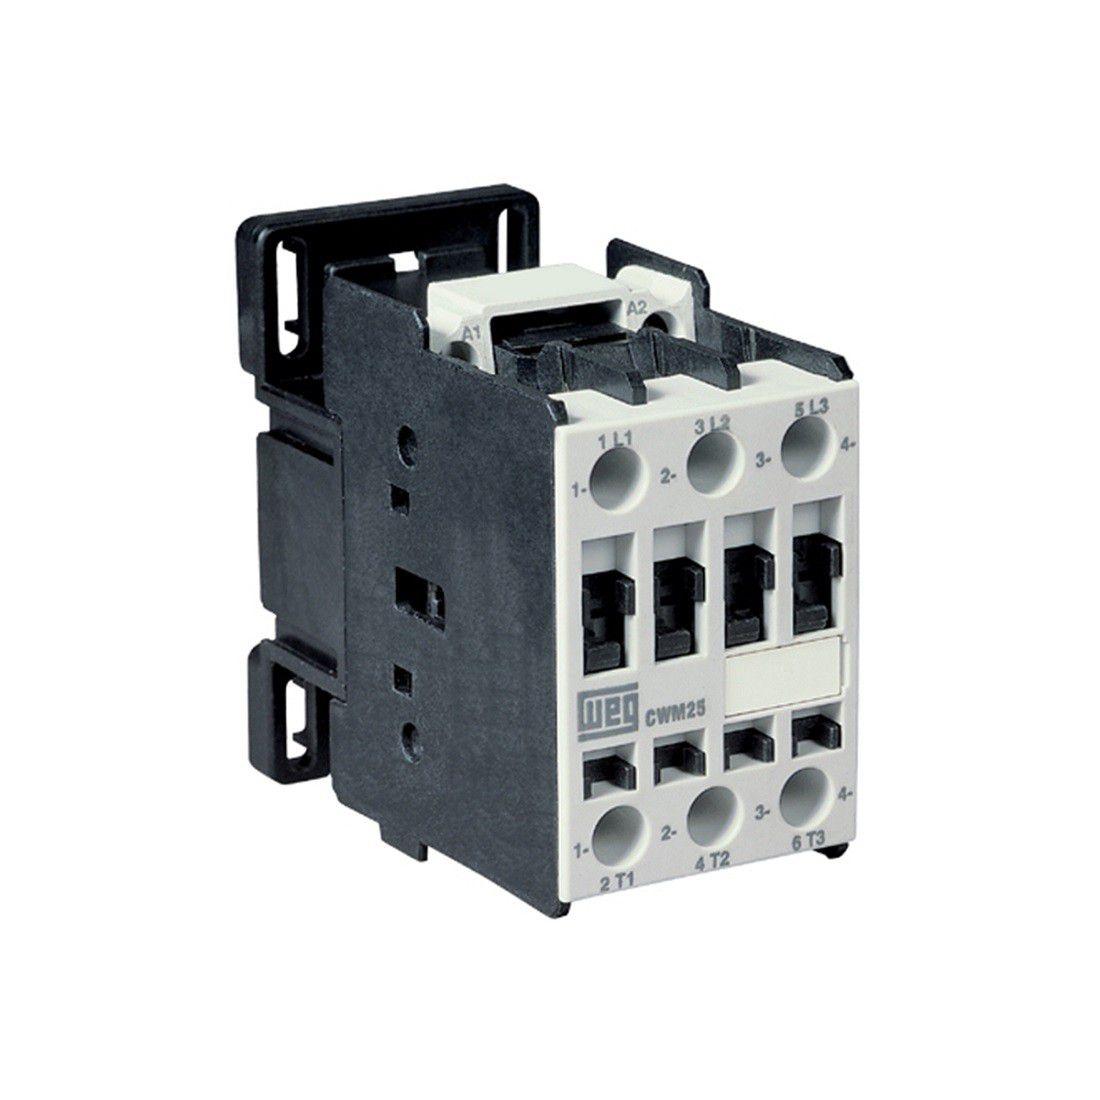 Contator 25A CWM25-00-30V26 220V WEG